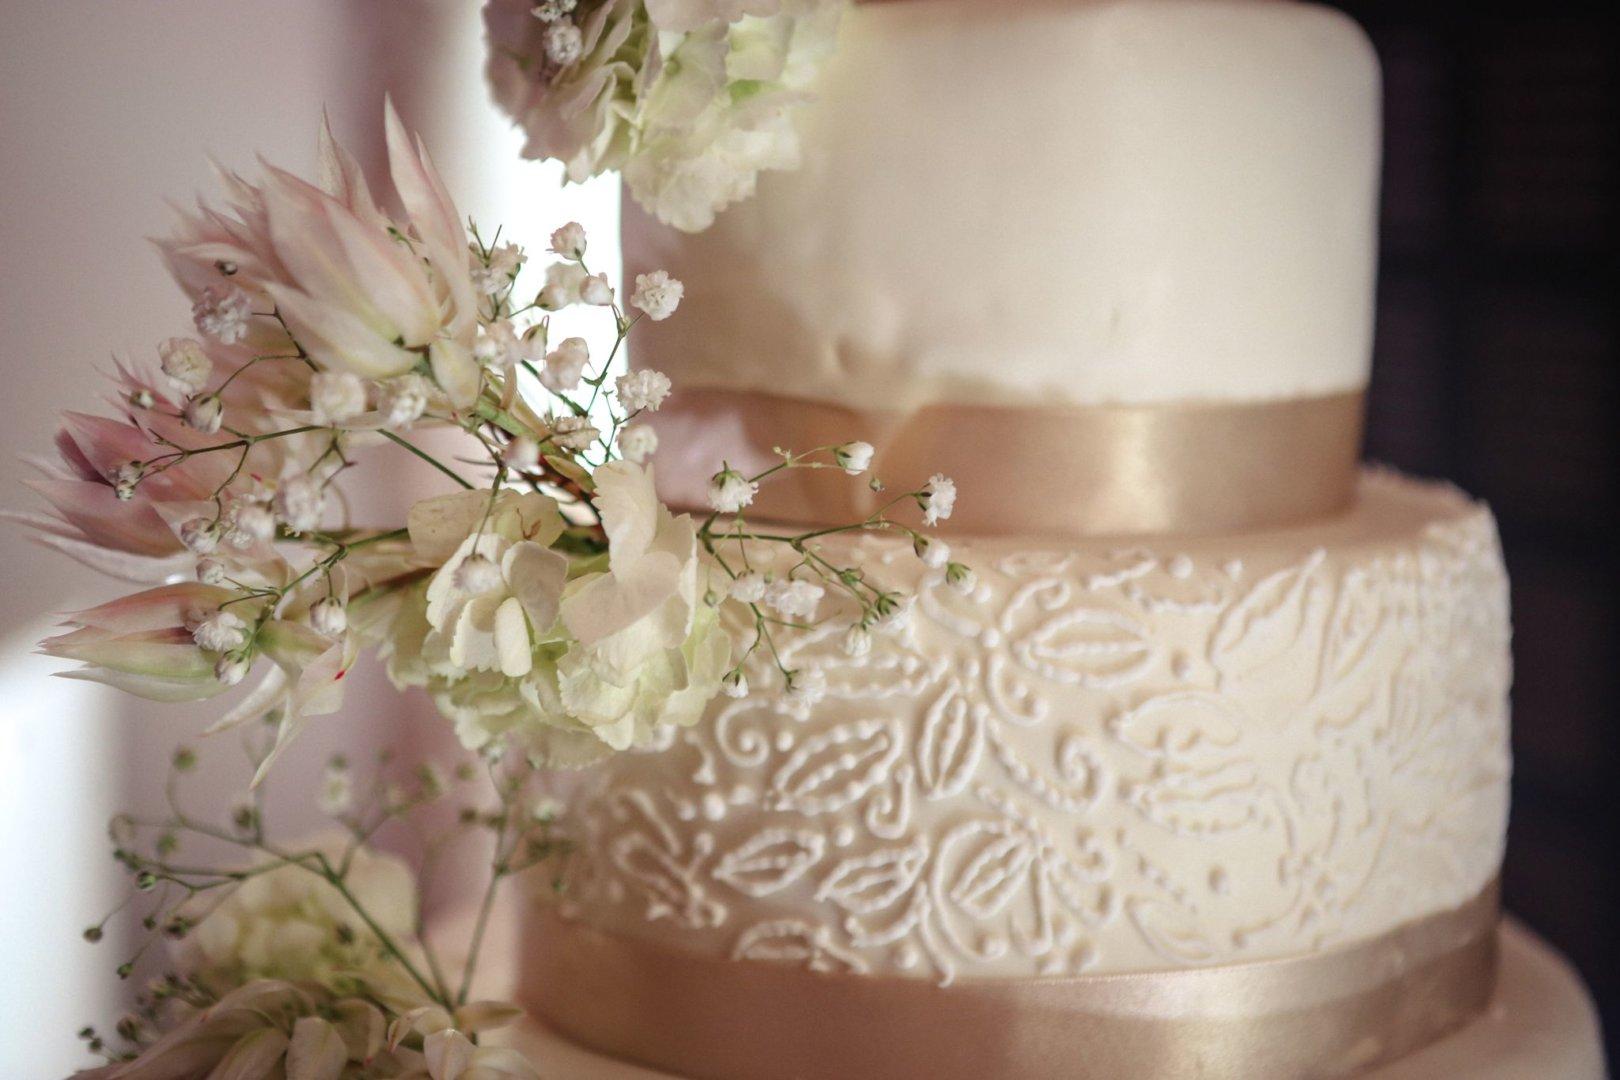 Le Wedding Cake Un Gâteau De Mariage Qui Impresionne Wedays